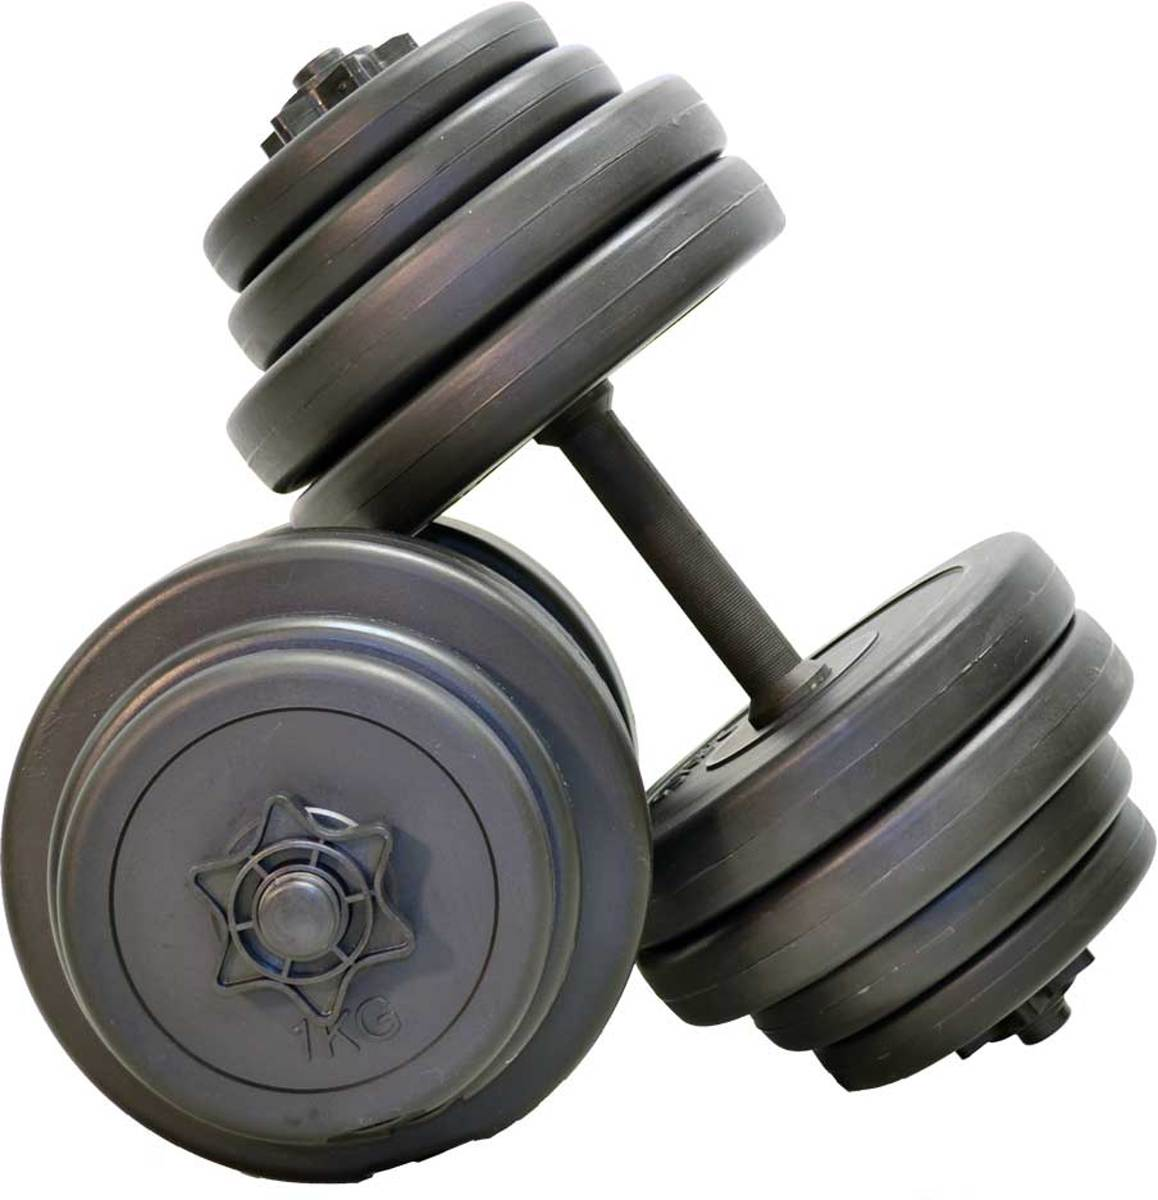 Verstelbare Dumbbellset - Focus Fitness - 2 stuks van 15 kg - Totaal: 30 kg kopen